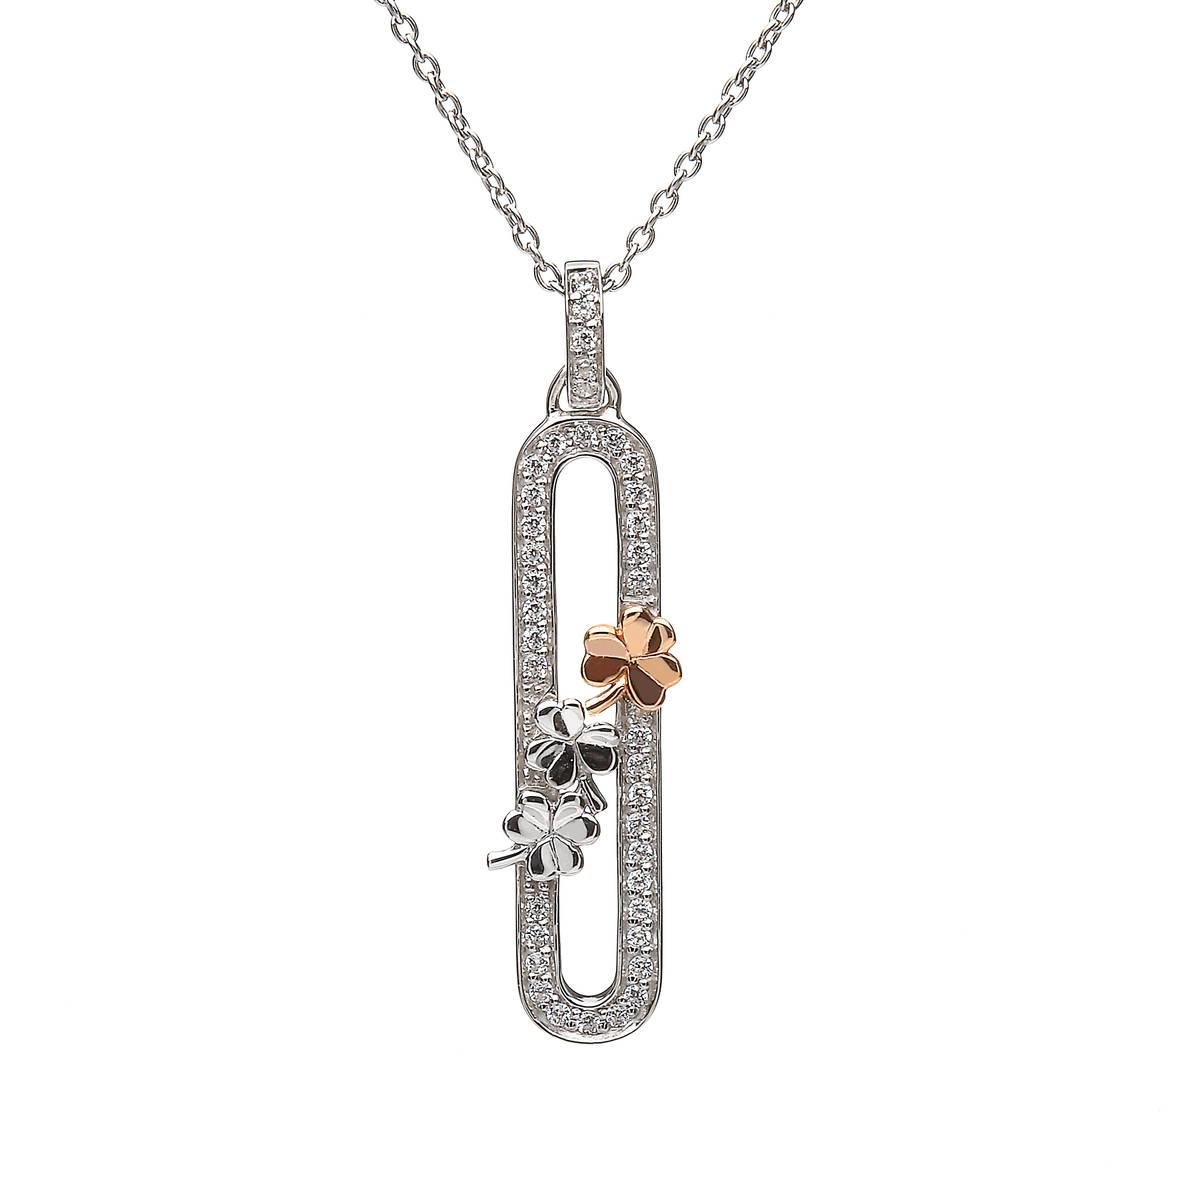 House of Lor silver cz pendant with silver Shamrocks 1 rose gold Shamrock made from rare Irish goldpkck/dpkck